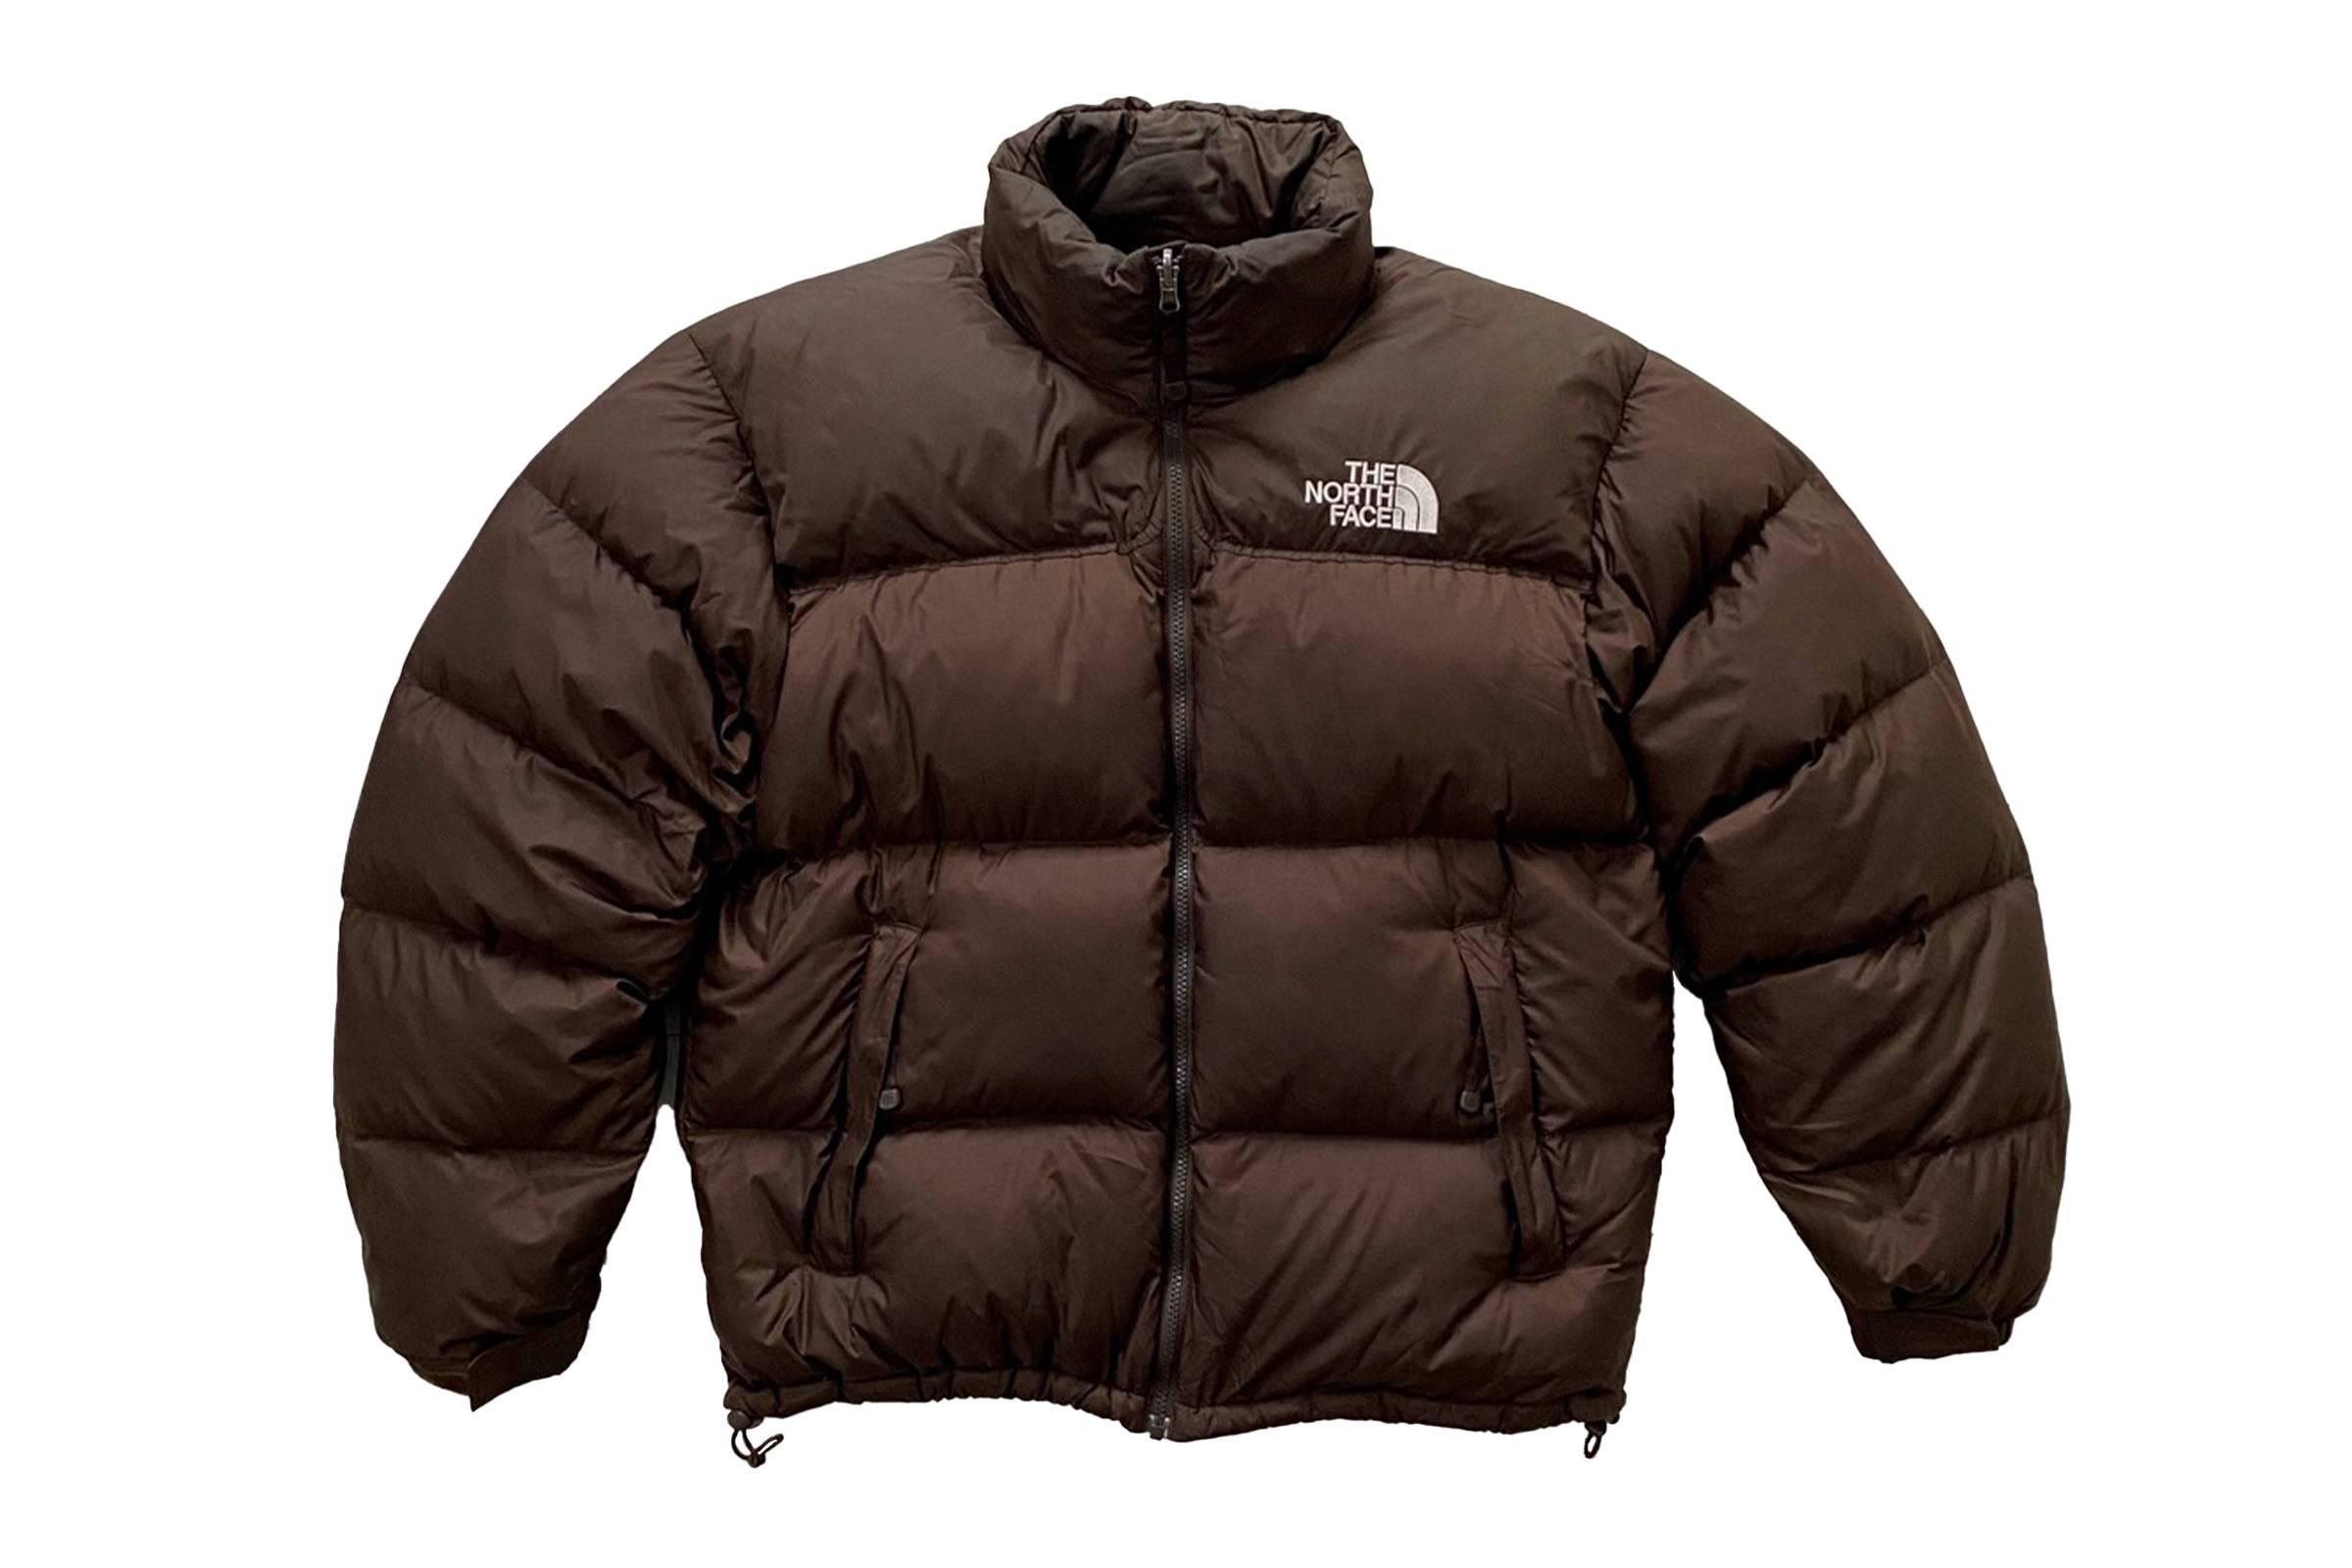 The North Face Vintage 1996 Nuptse Jacket